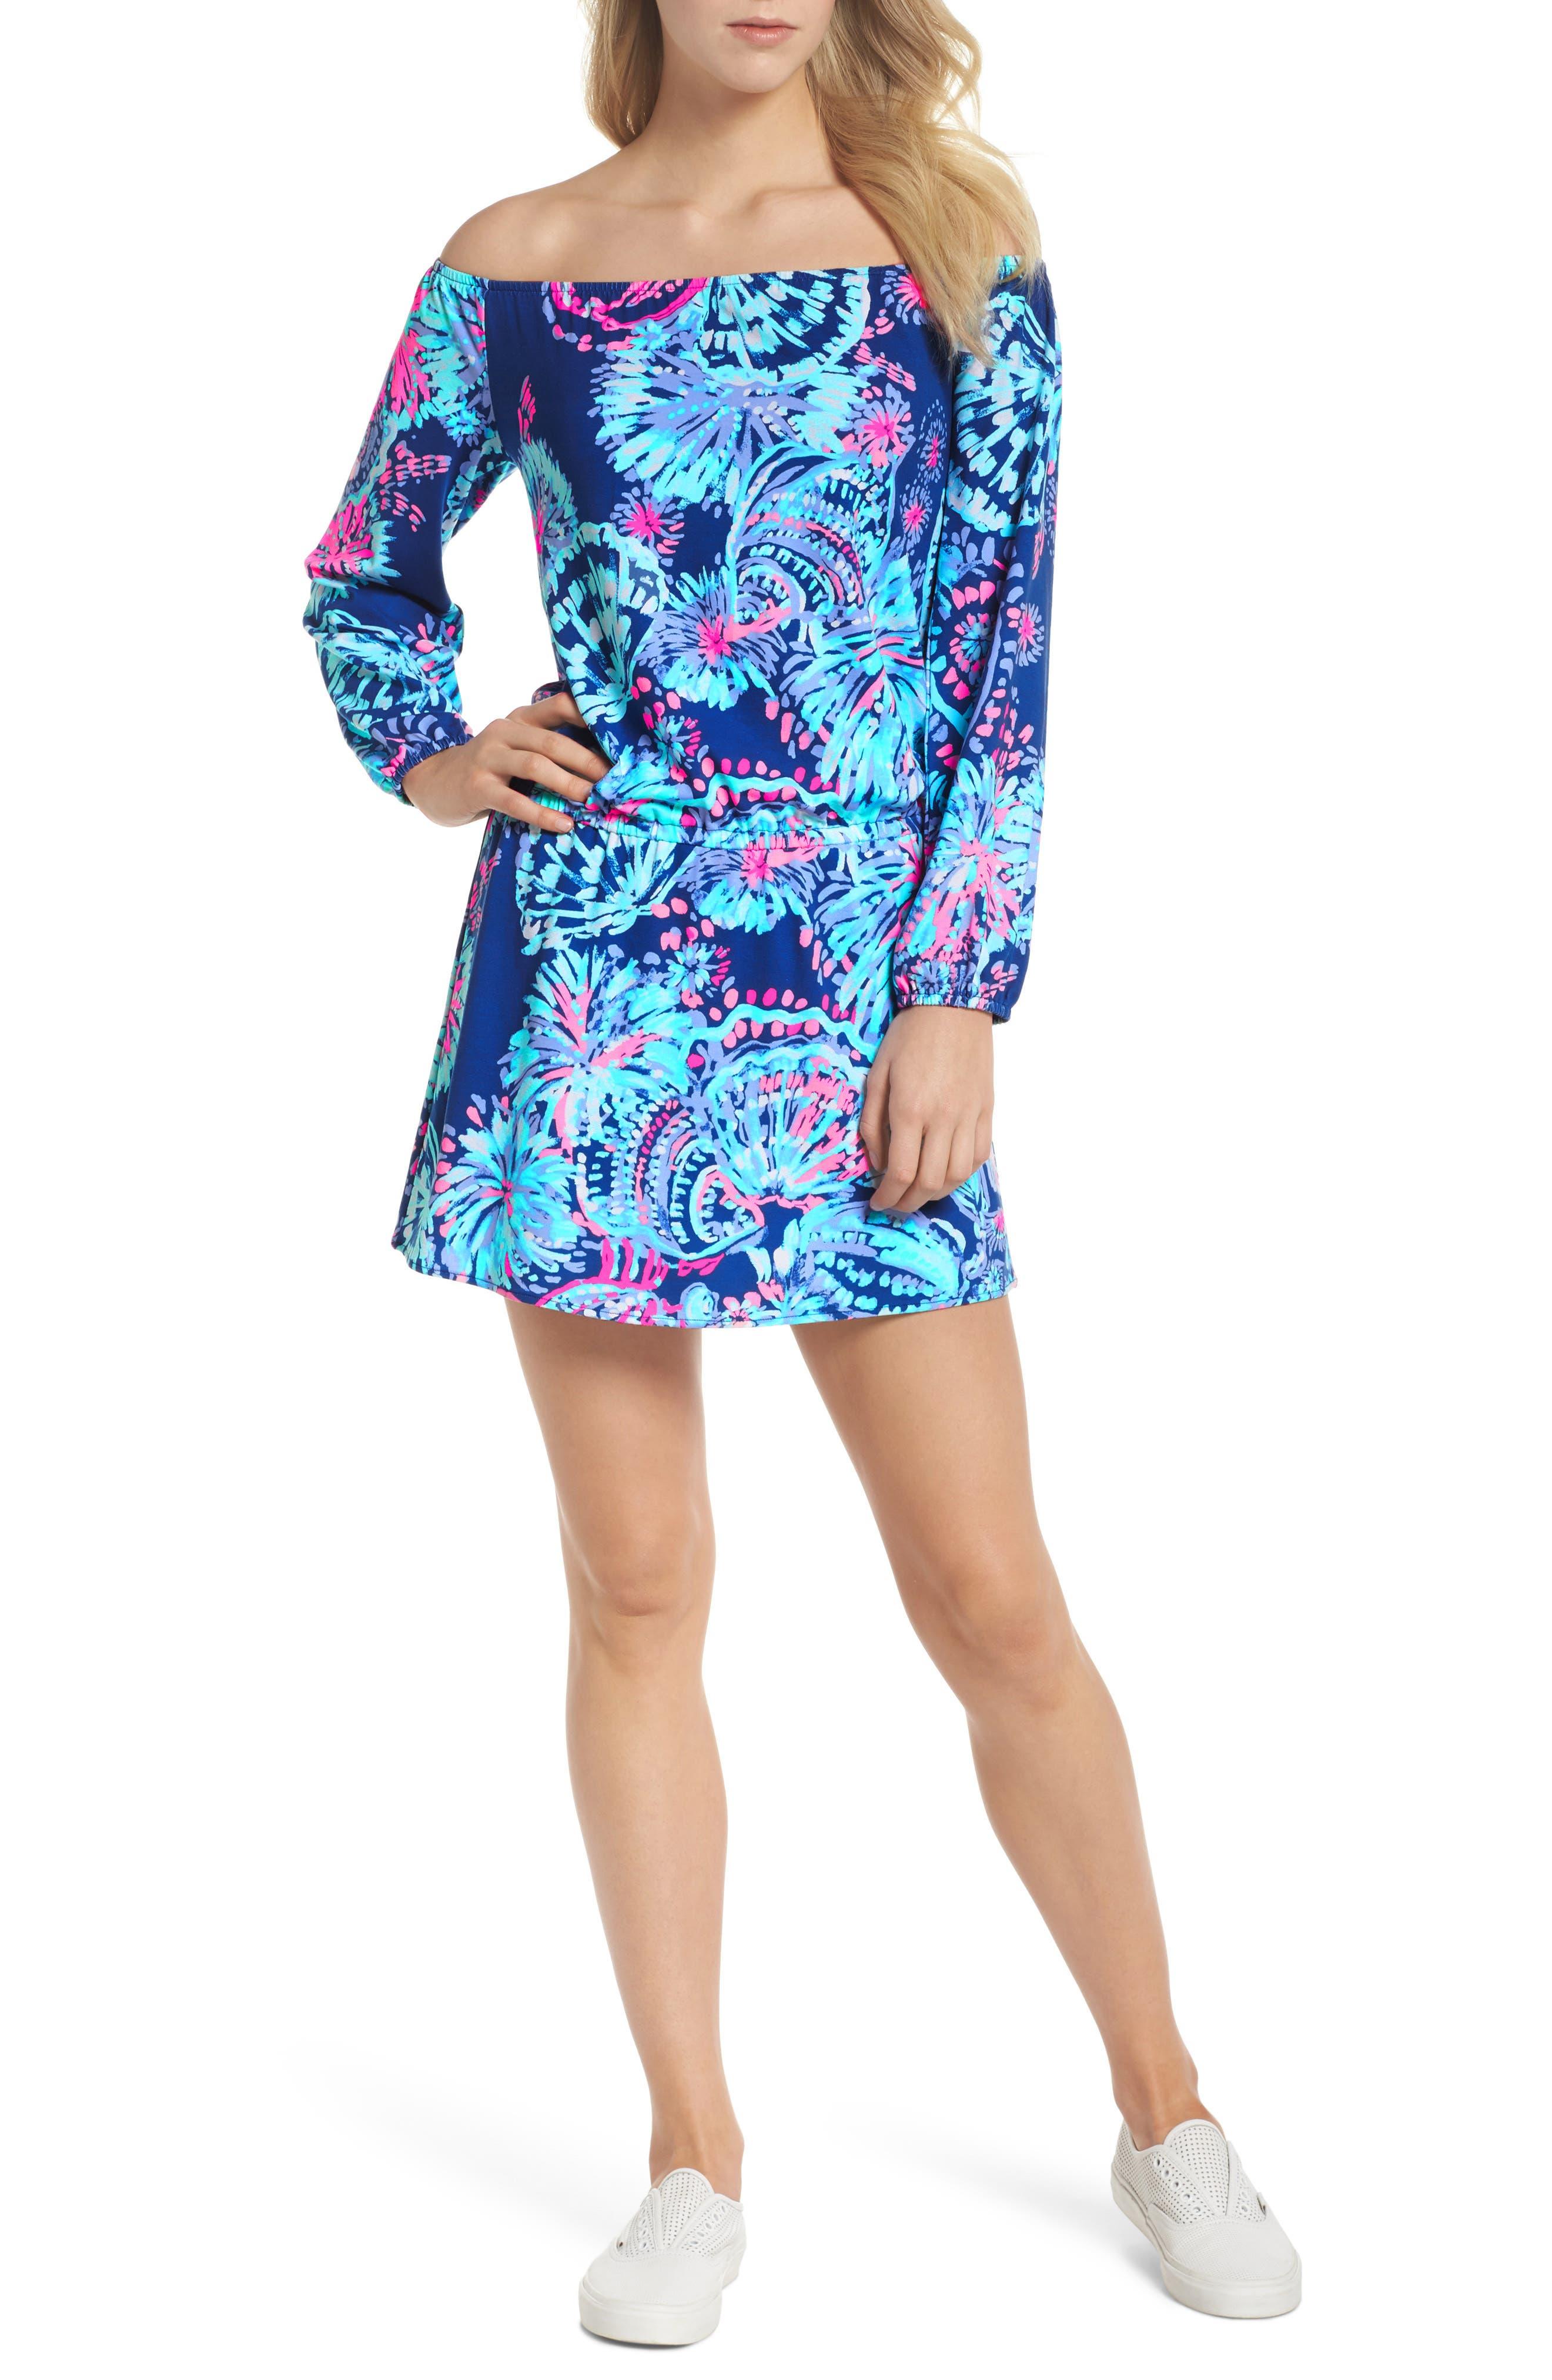 Lana Skort Romper,                         Main,                         color, Deep Indigo Gypsea Girl